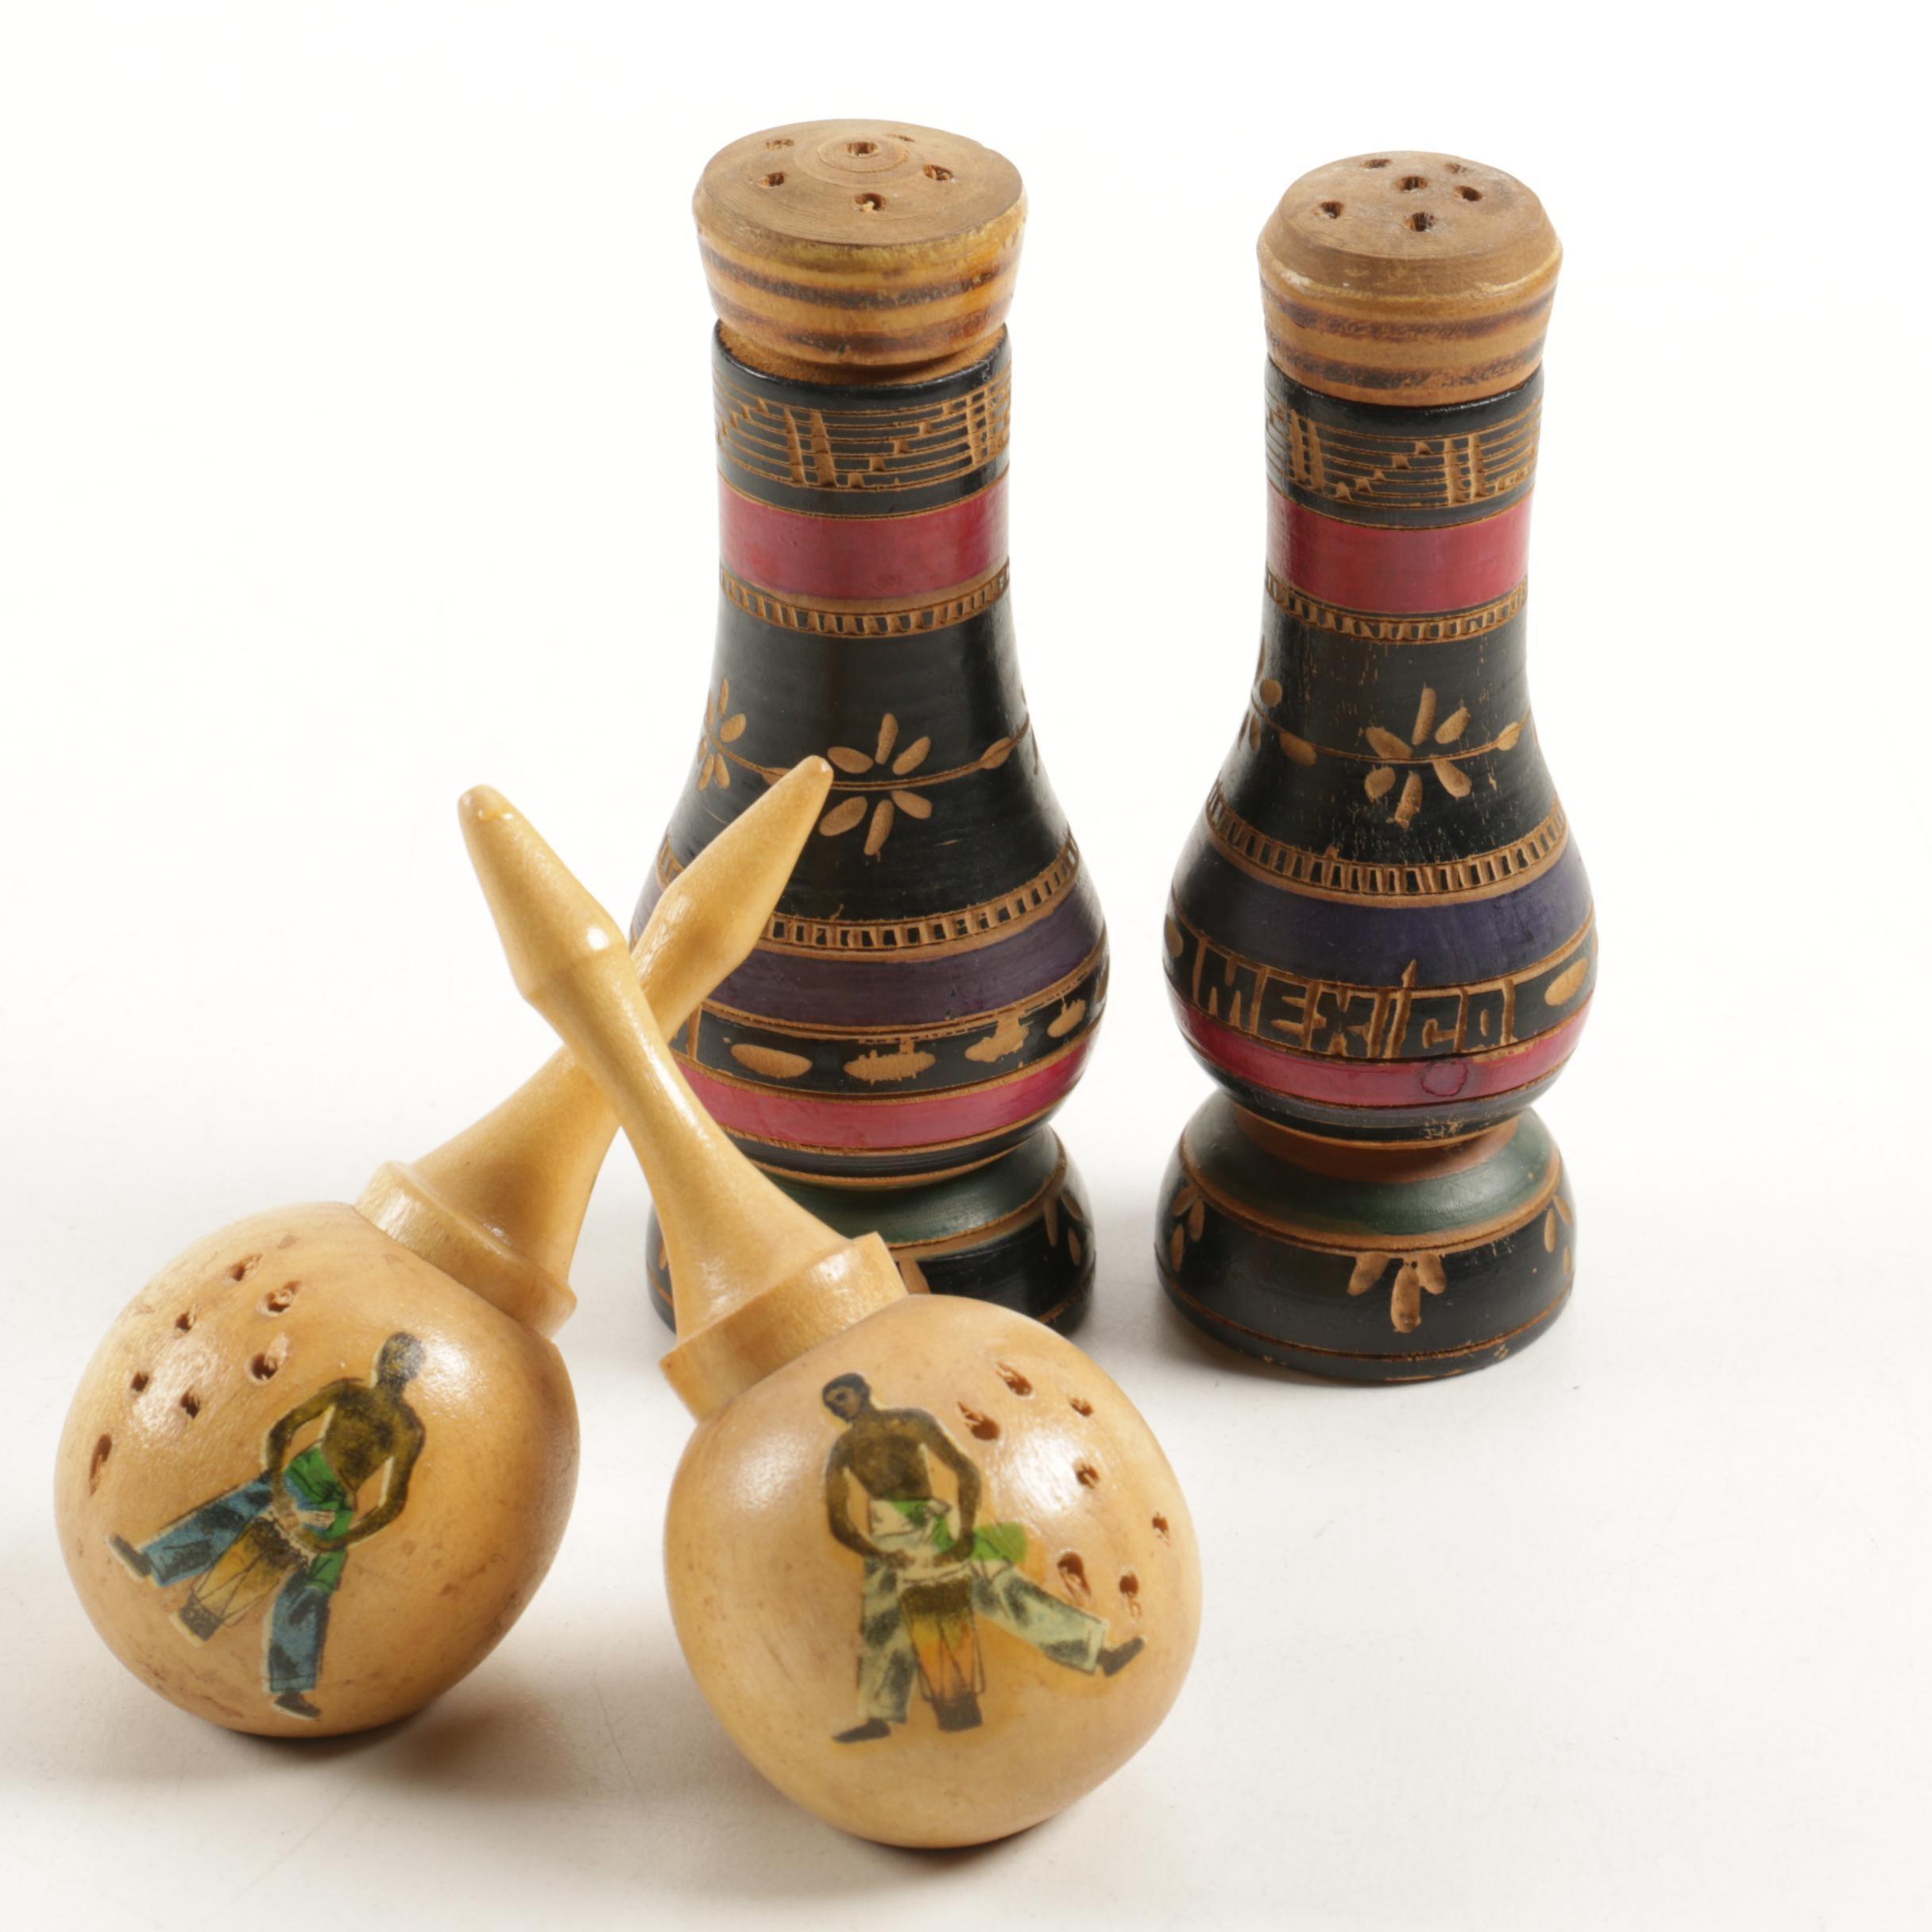 Handmade Wooden Salt and Pepper Shakers